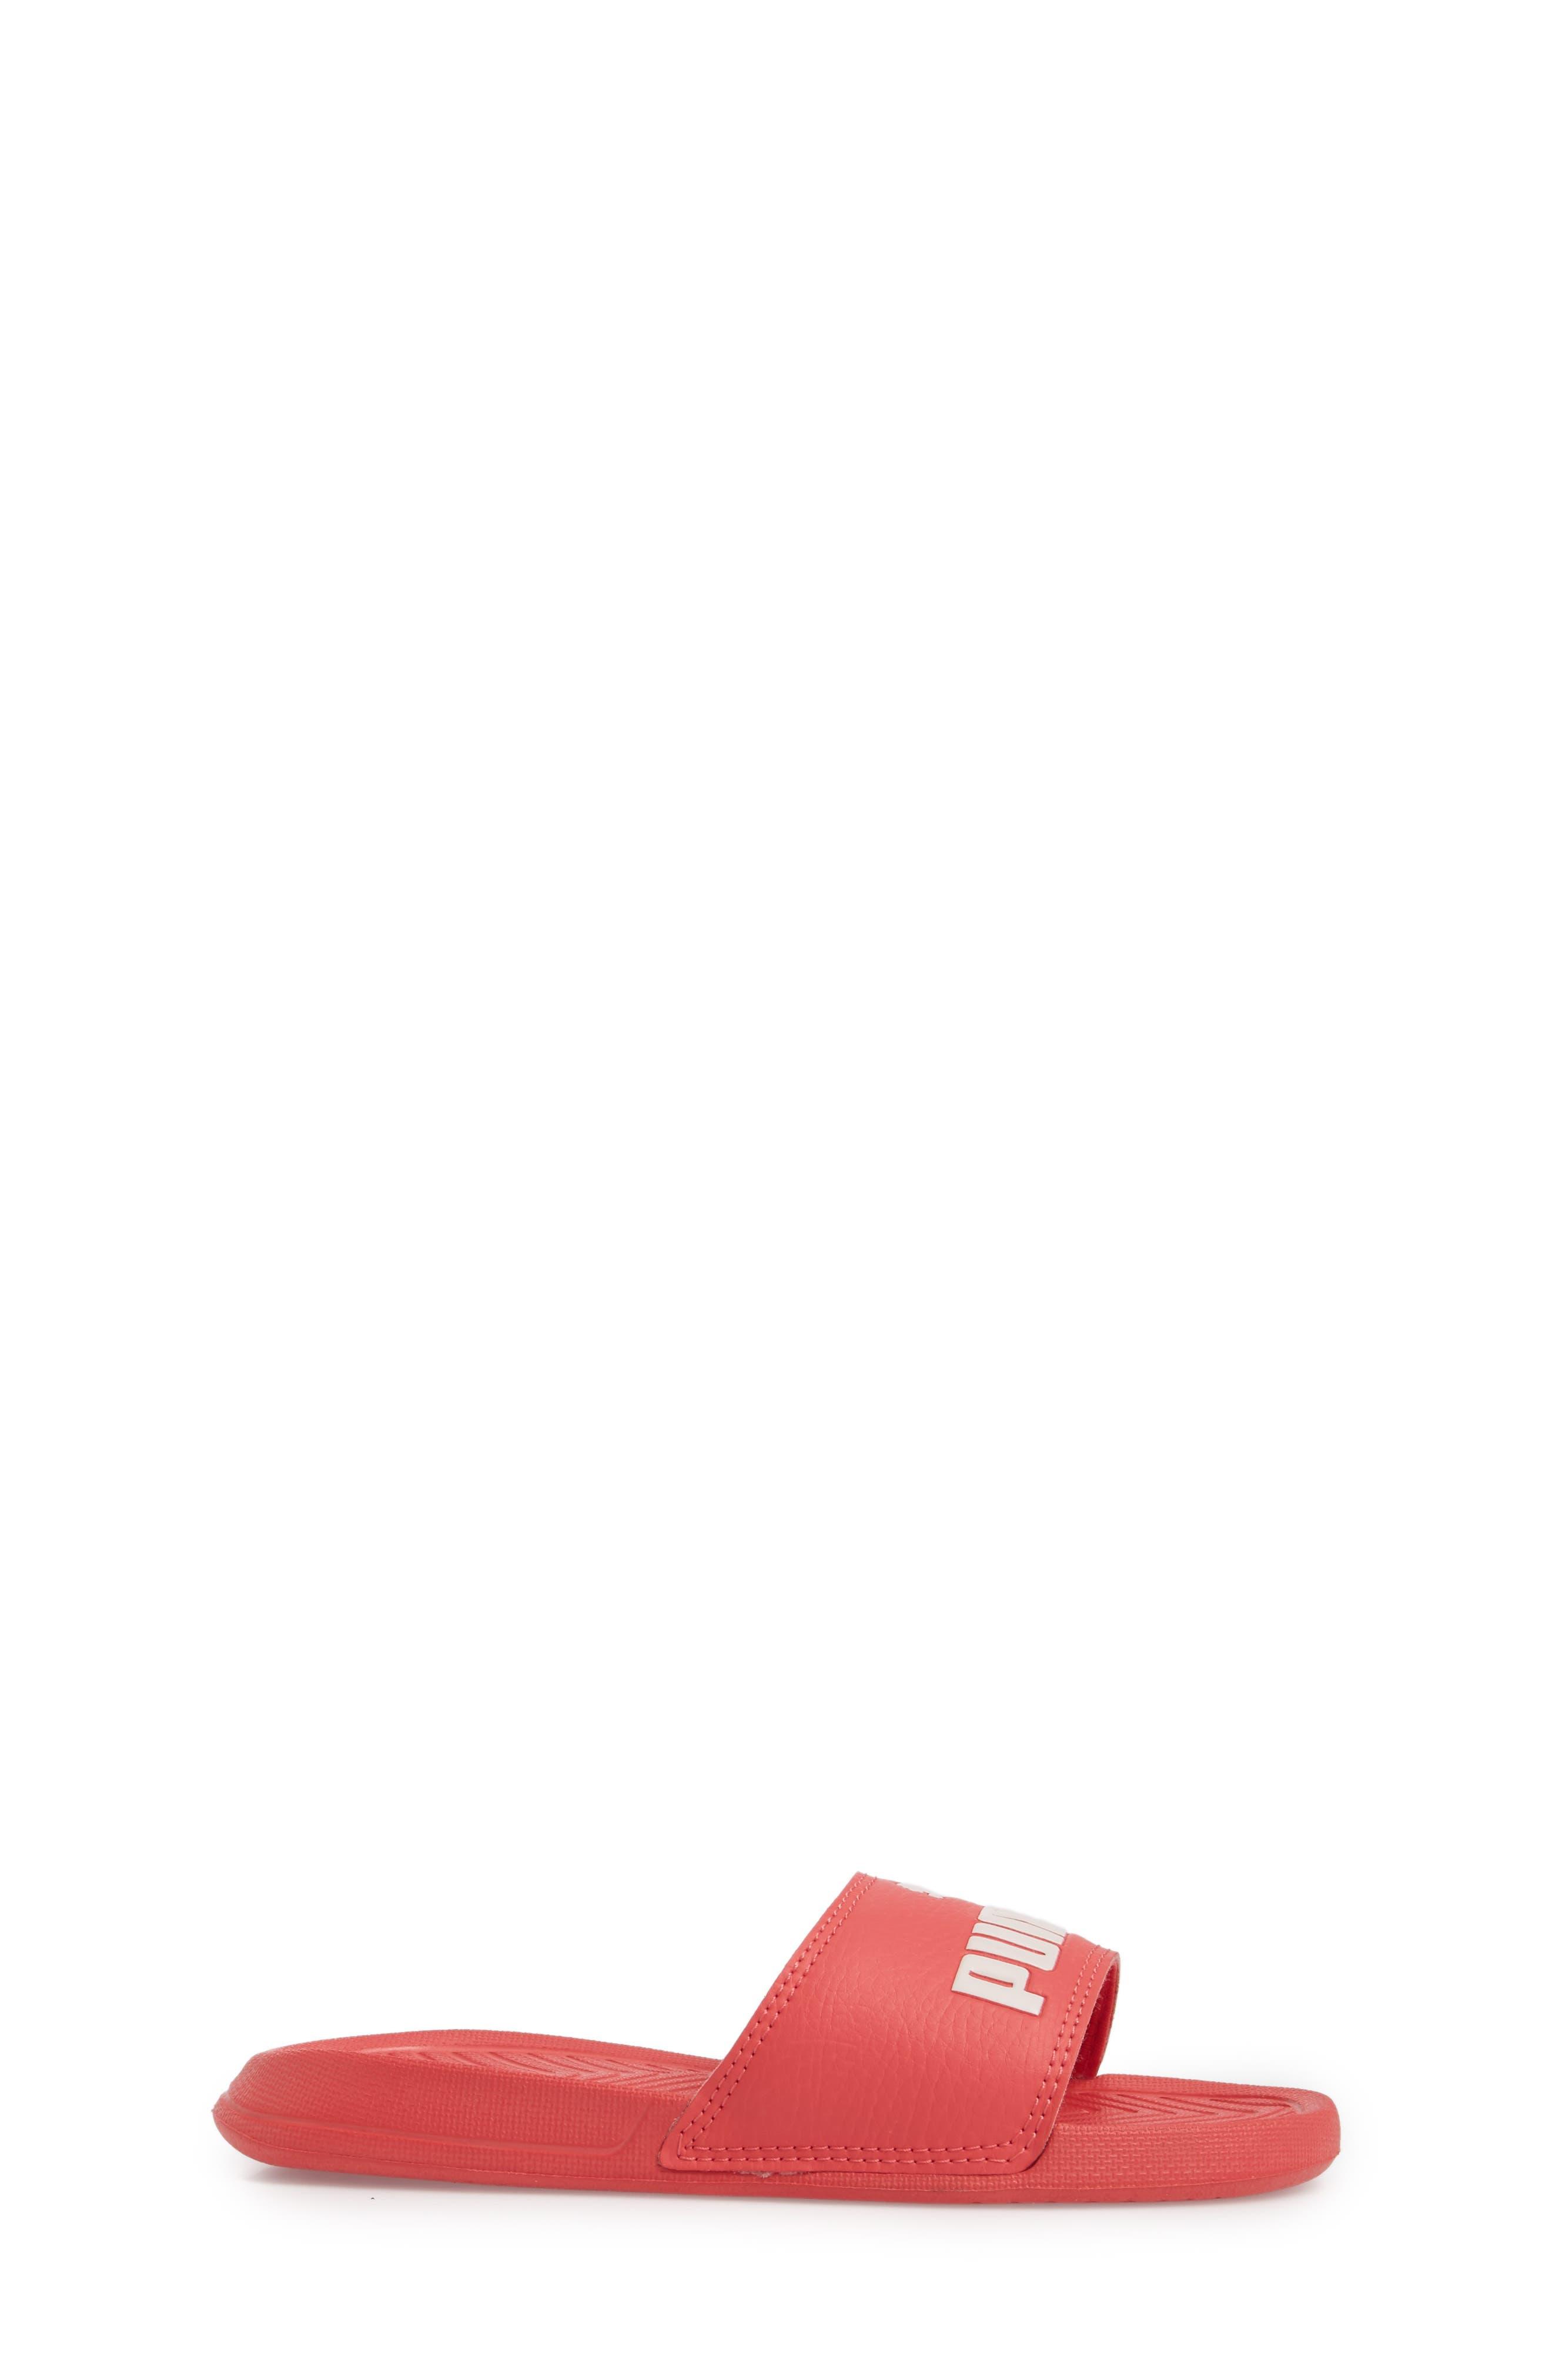 Popcat Slide Sandal,                             Alternate thumbnail 3, color,                             Paradise Pink/ Pearl